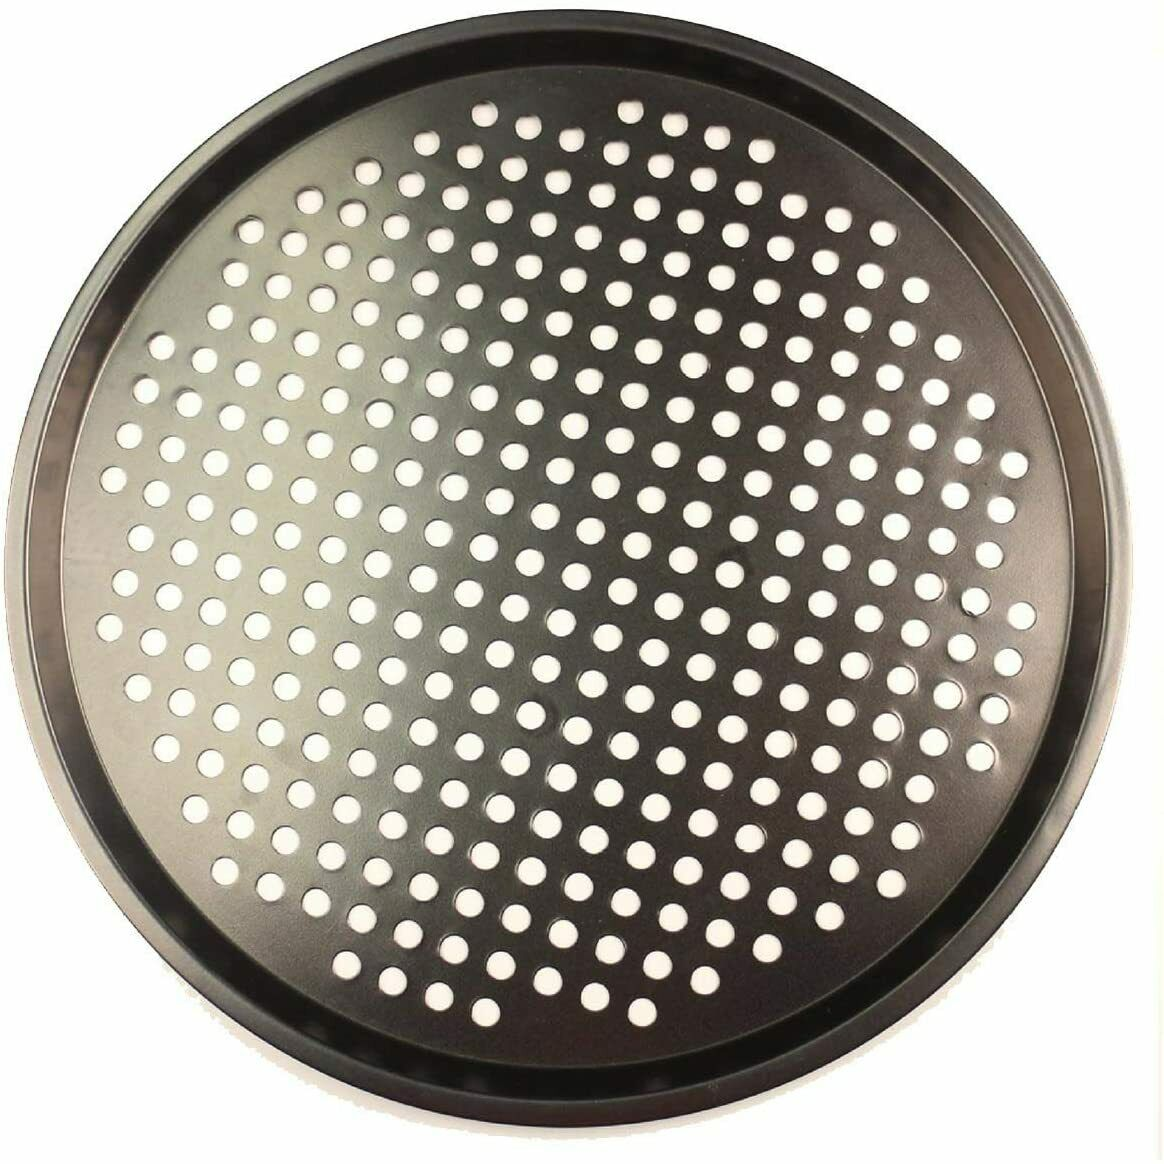 Pizza Pan Nonstick Coating Carbon Steel 12 Inch Mesh Crisper Tray